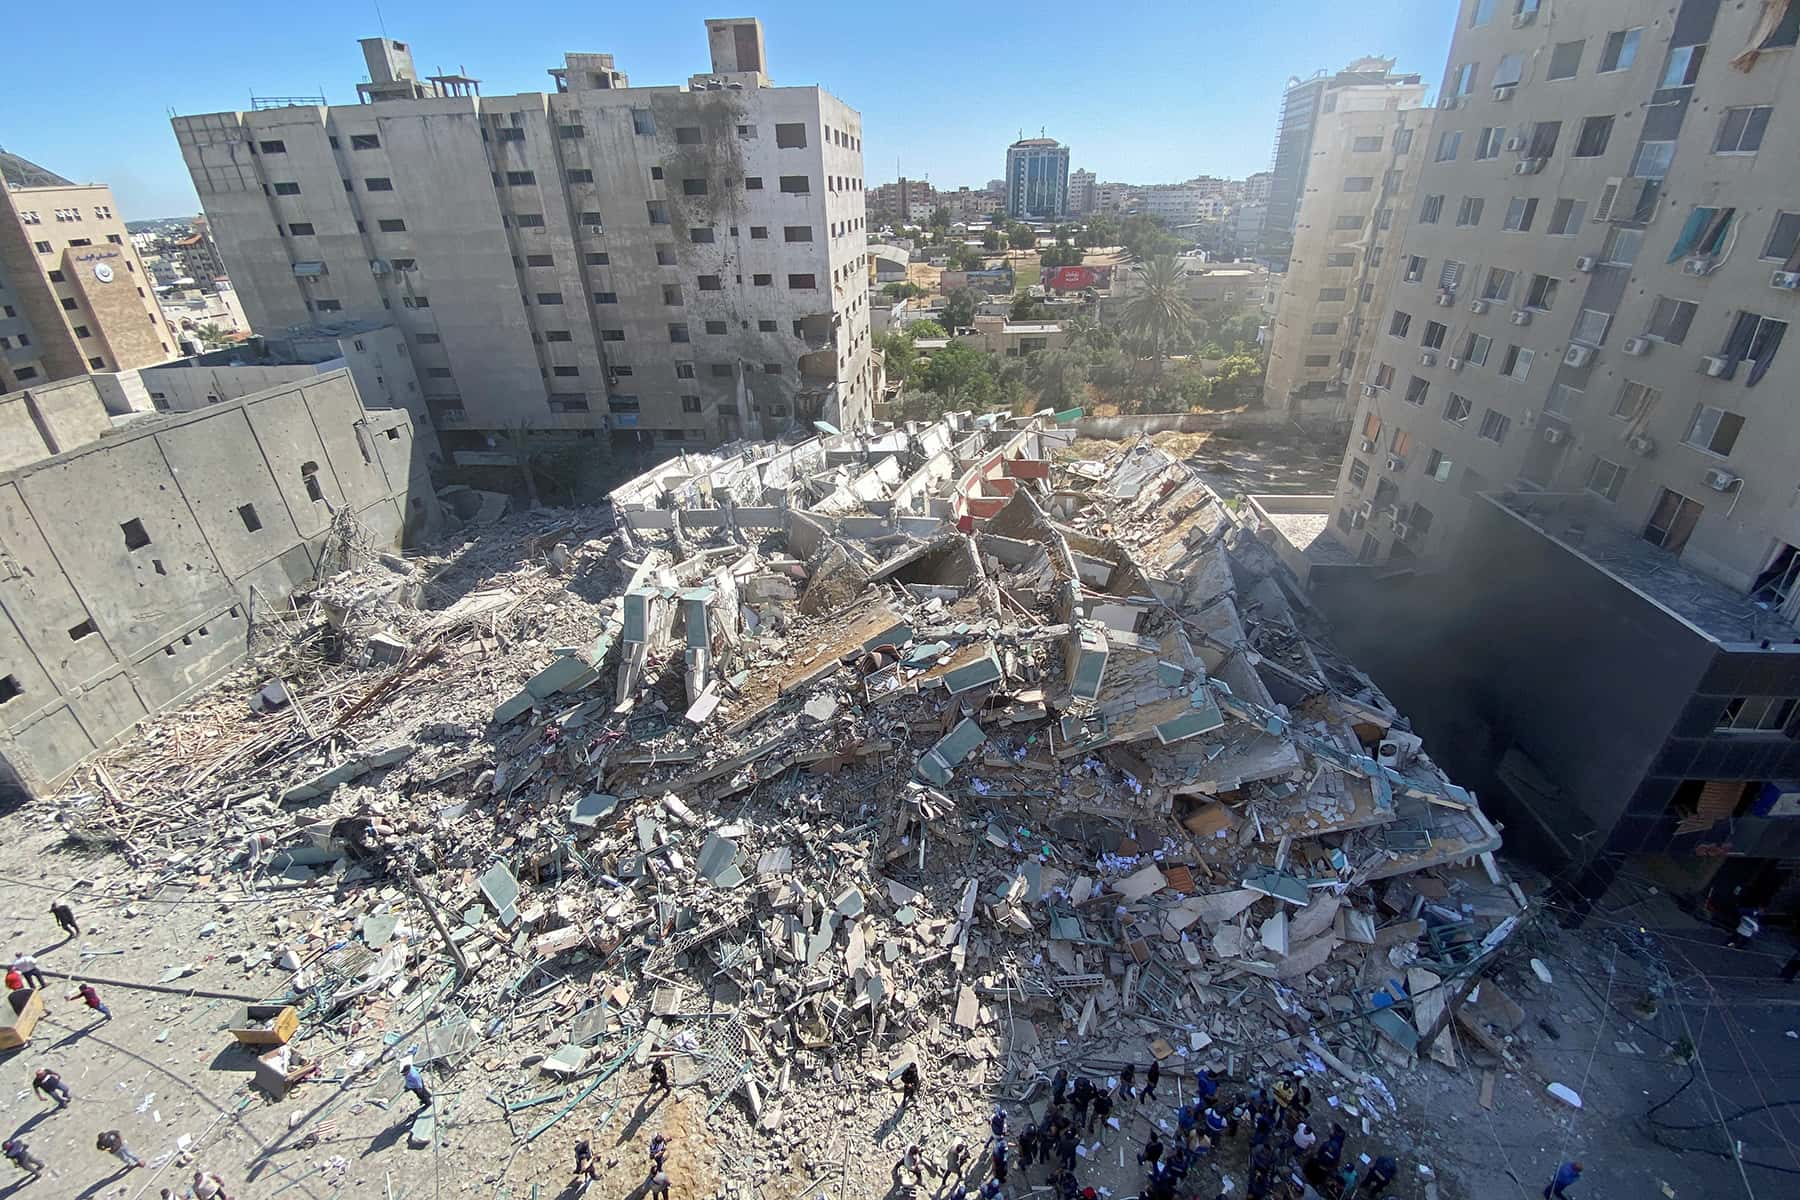 051621_IsraeliBombsMedia_02